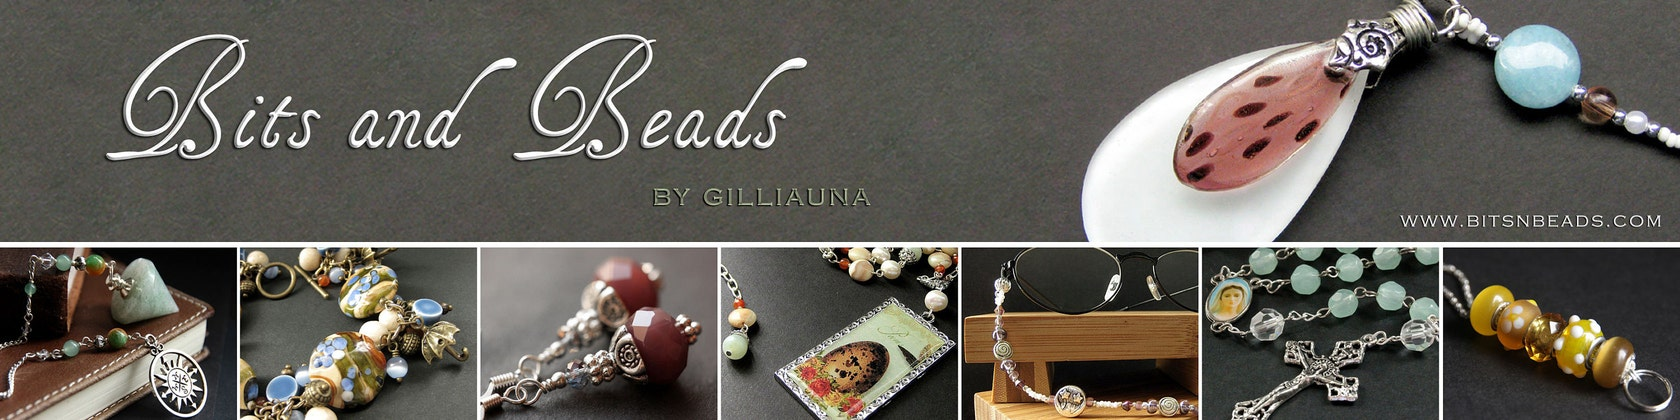 Floating Peonies Lampwork Glass Beaded Earrings Handmade Jewelry by Gilliauna